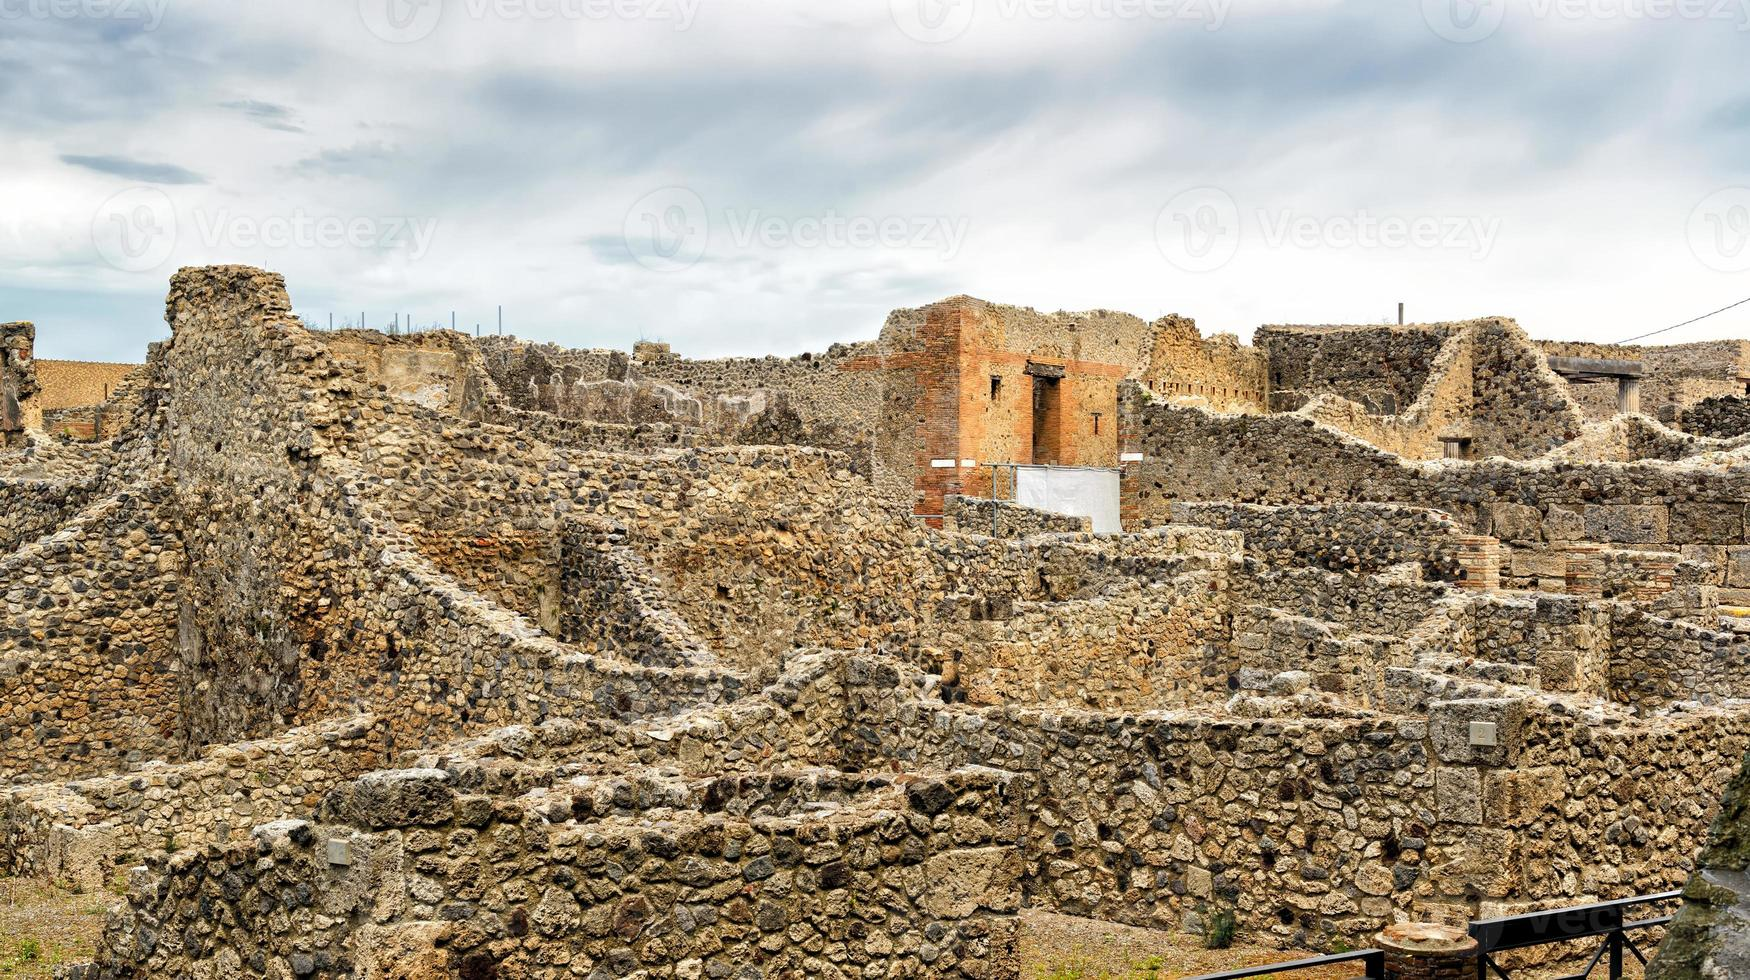 Ruins of Pompeii, Italy photo